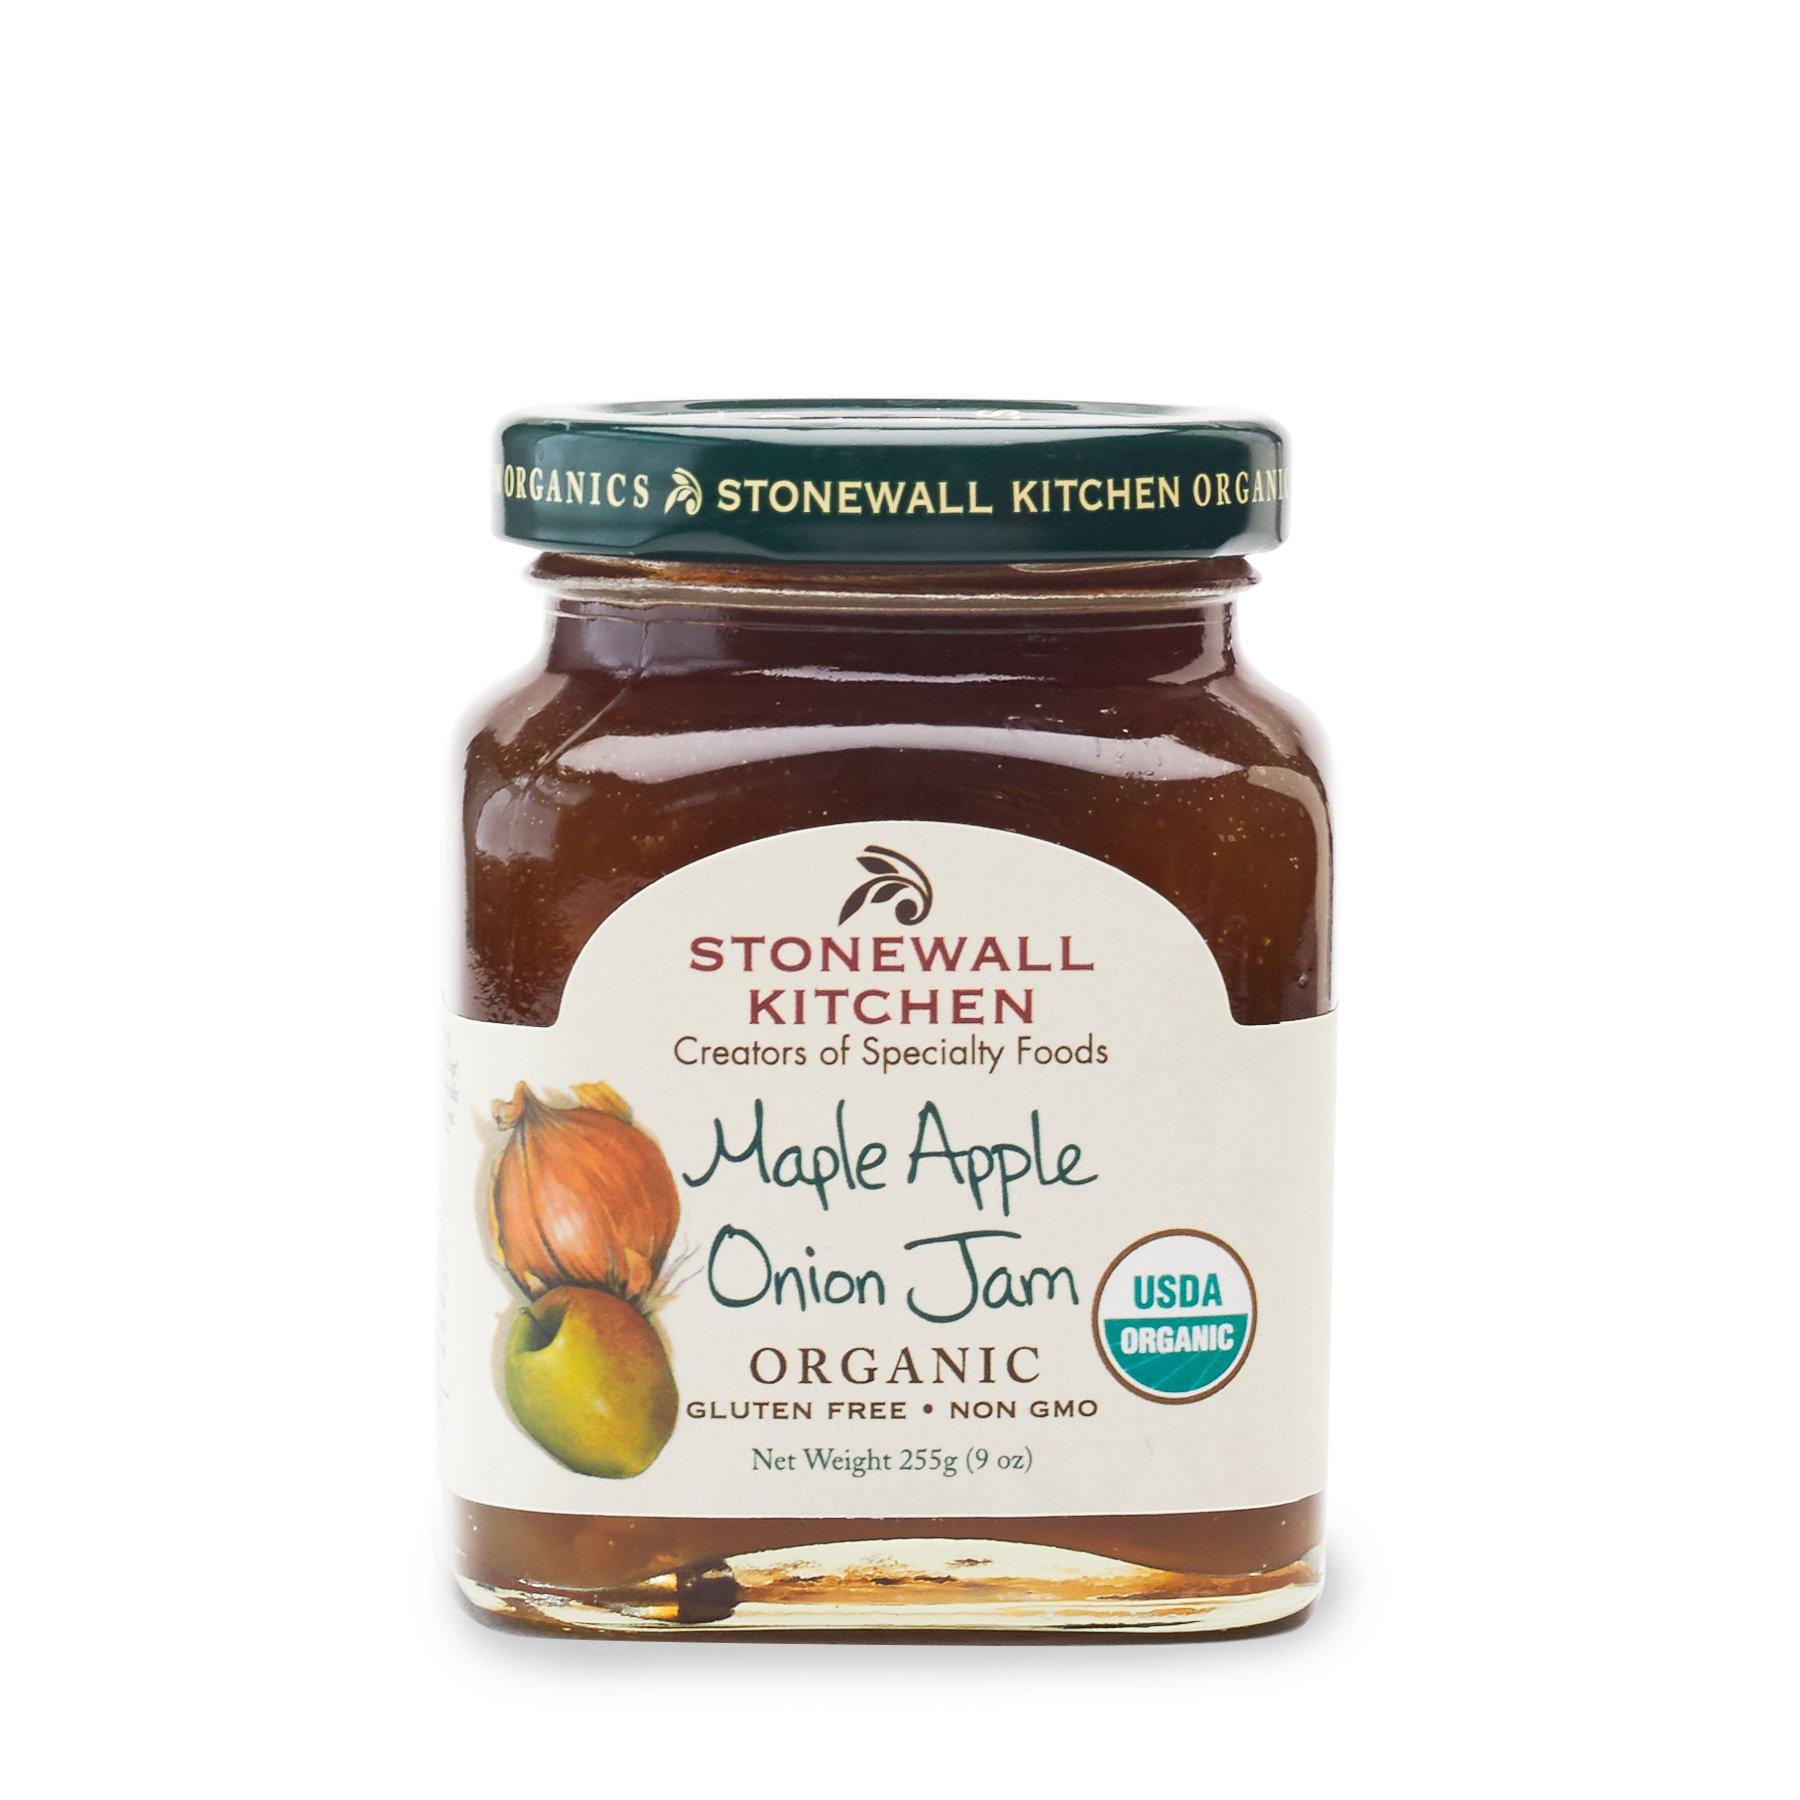 Stonewall Kitchen Maple Apple Onion Jam, 9 Ounces